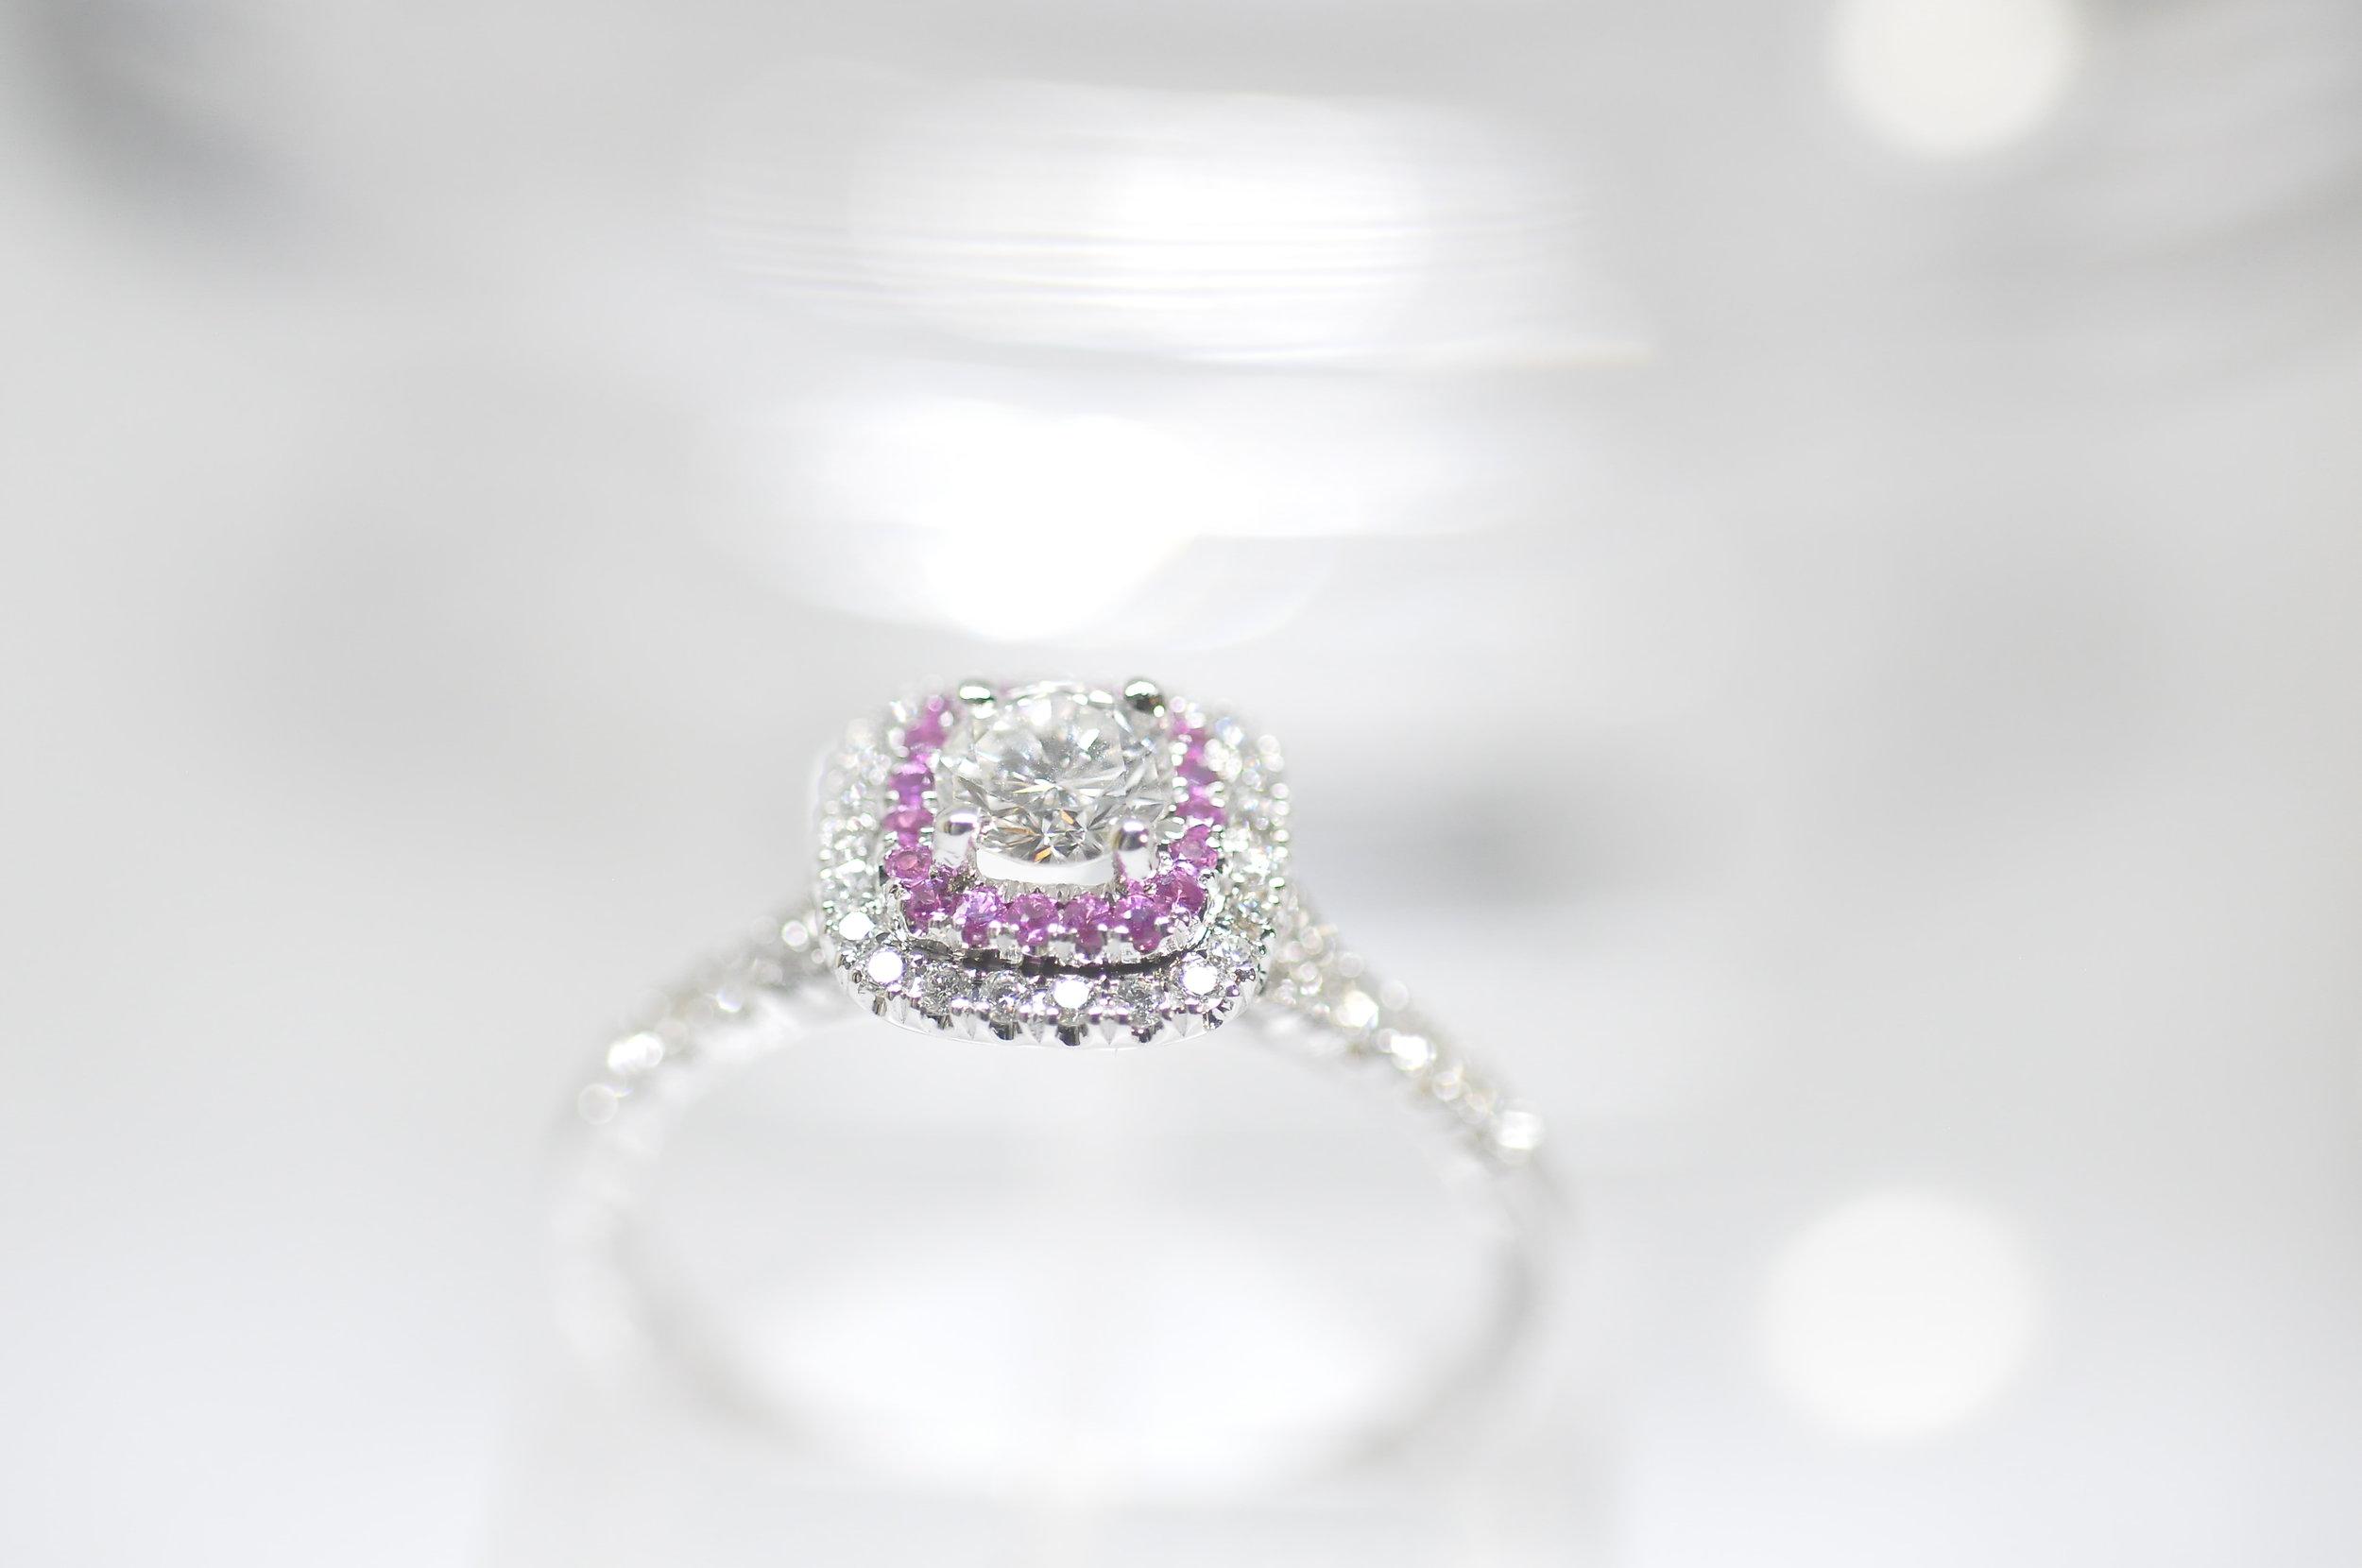 Pink Sapphire Halo Diamond Engagement Ring Toronto.JPG